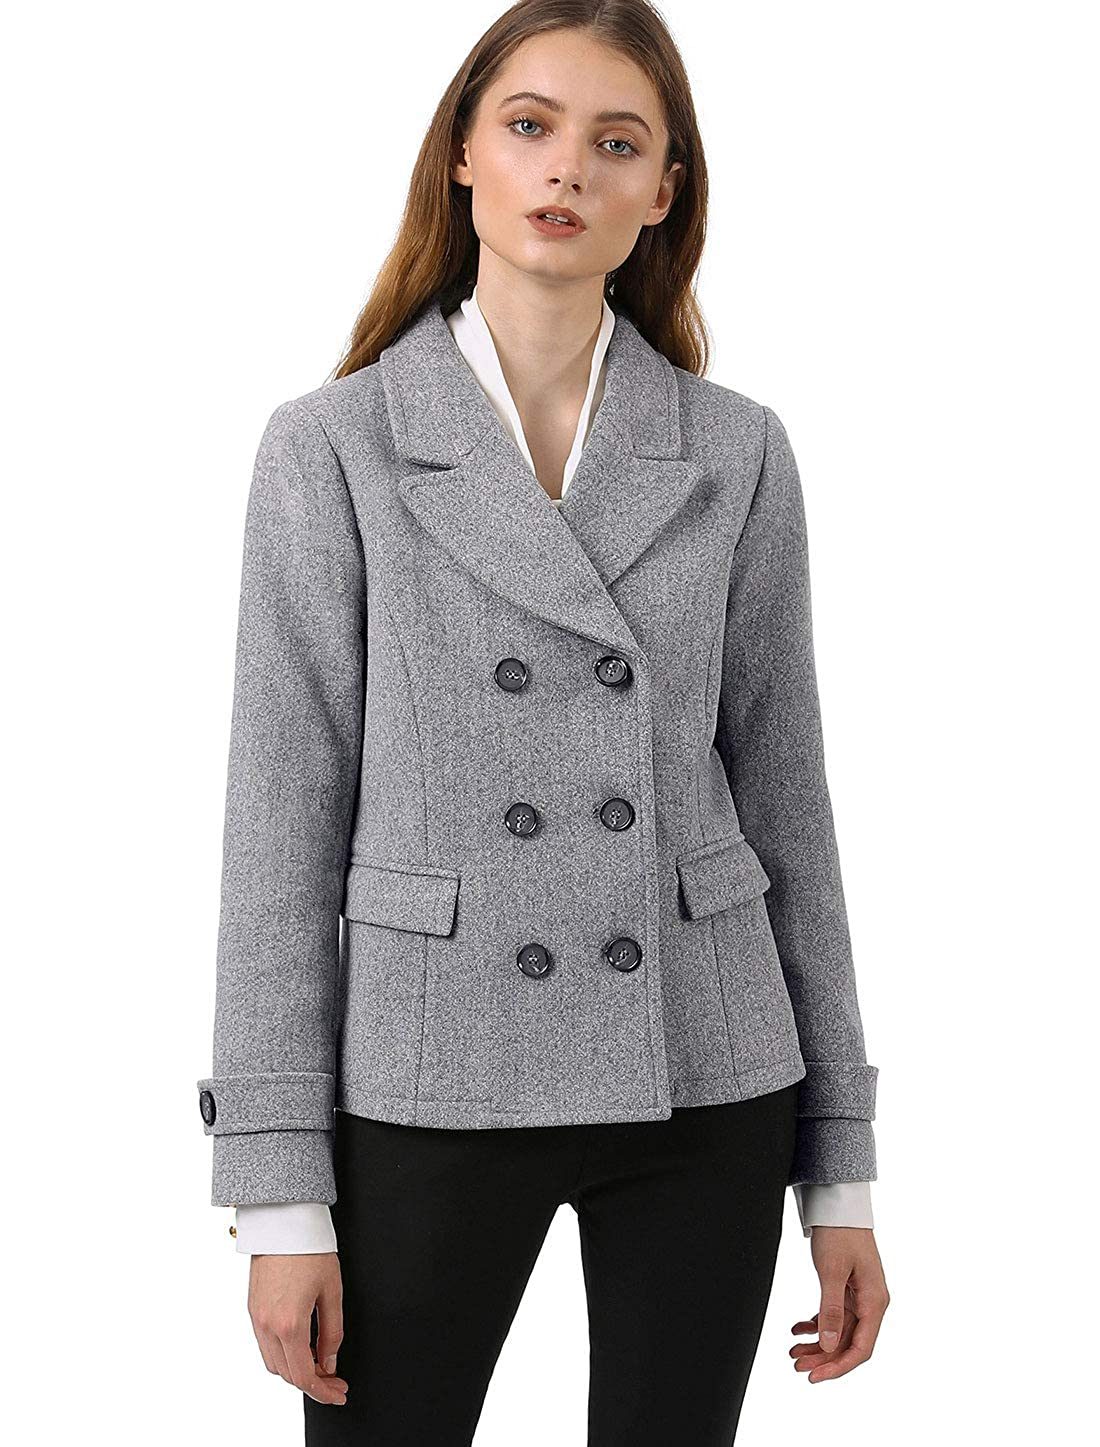 885c352fb2f Allegra K Women s Notched Lapel Double Breasted Pea Coat  Amazon.co.uk   Clothing